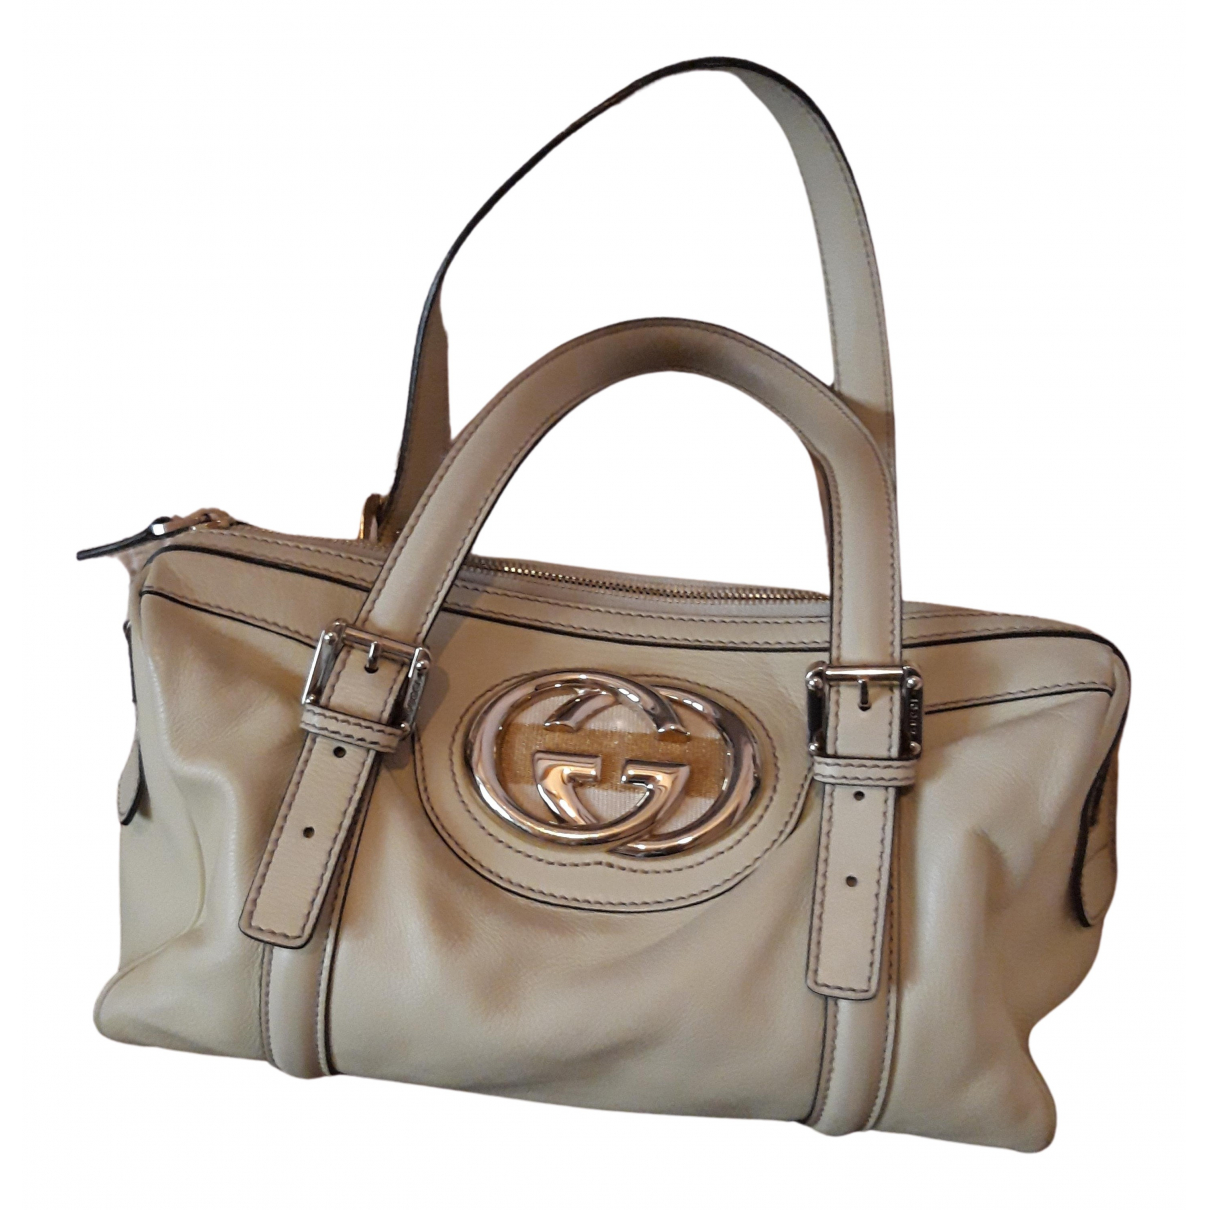 Gucci N Beige Leather handbag for Women N